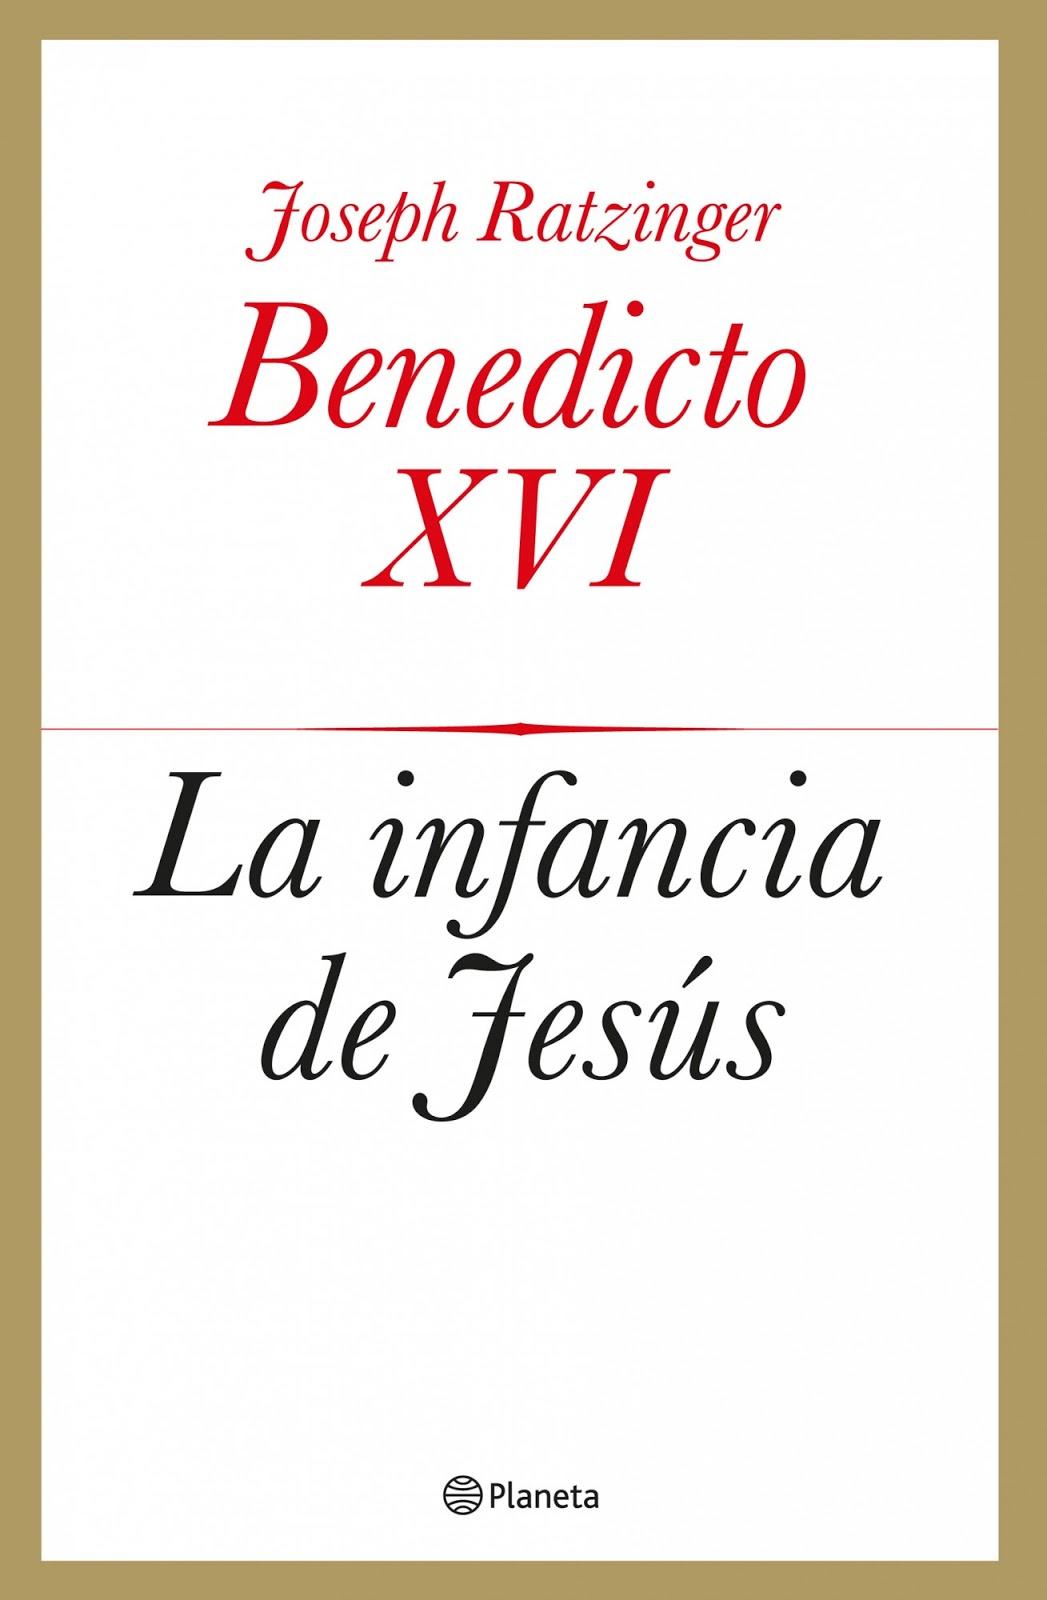 Joseph ratzinger jesus de nazaret 2 pdf